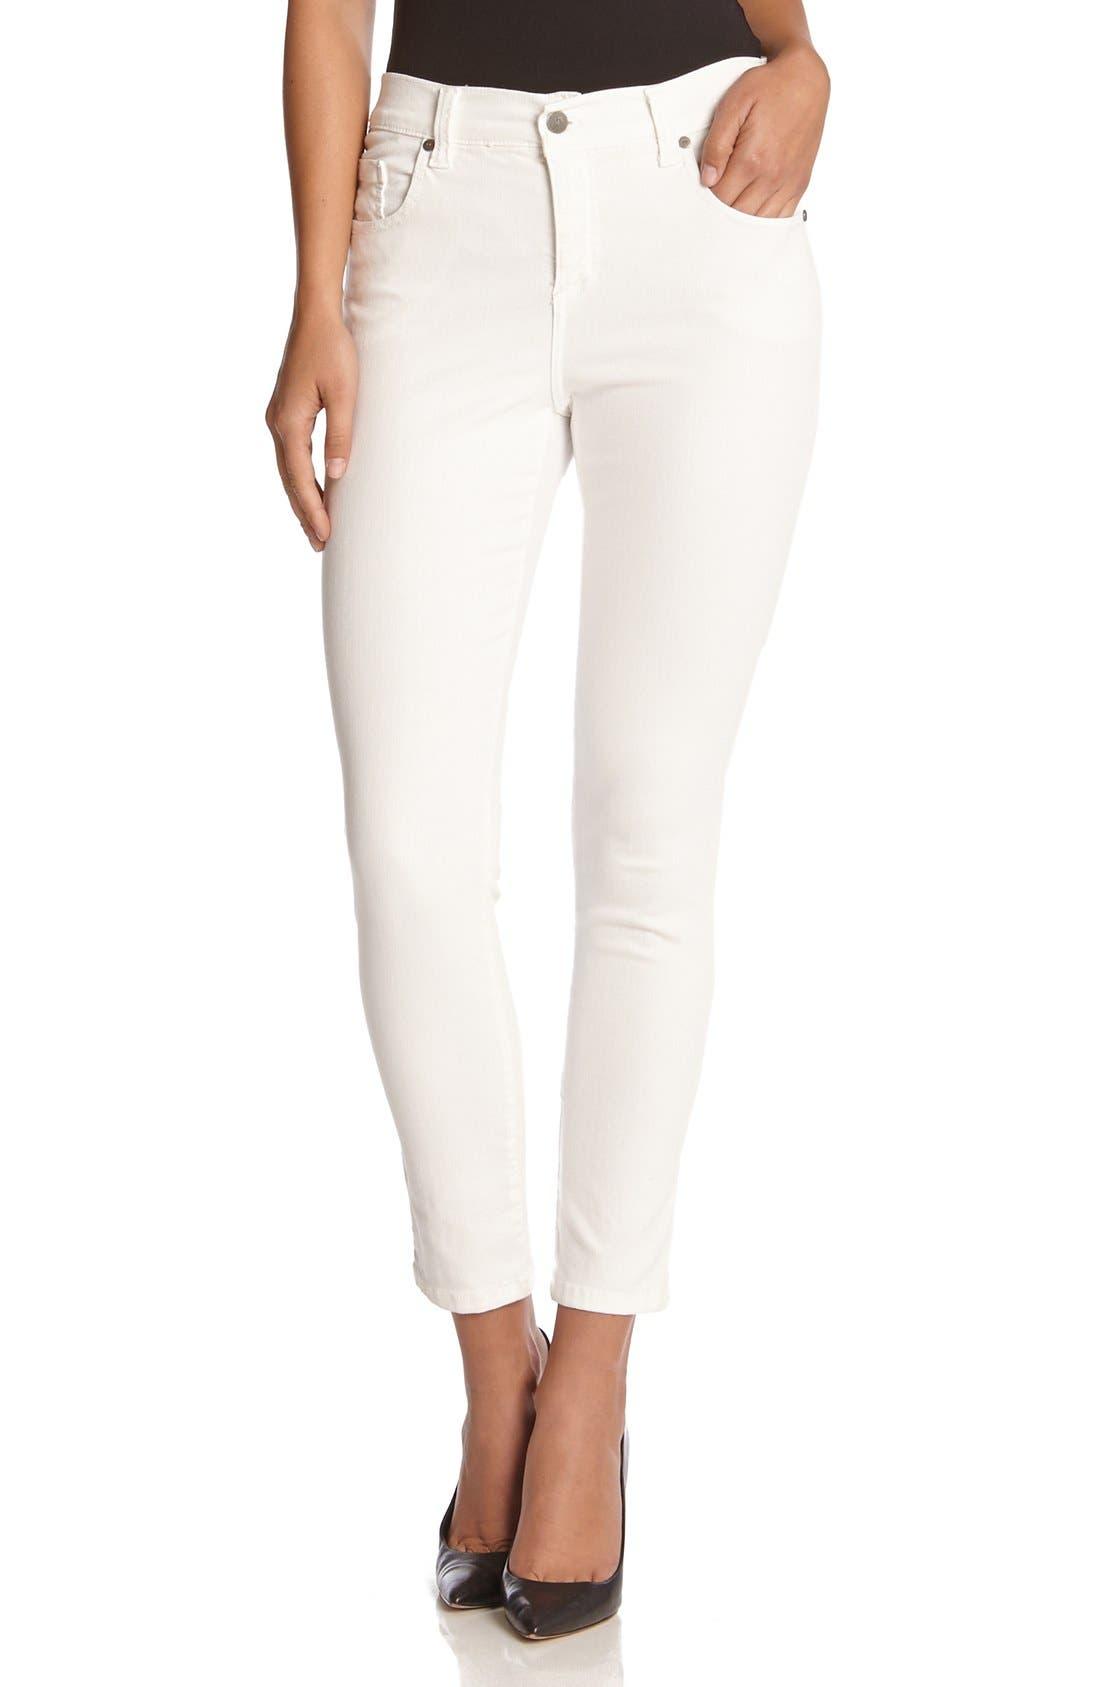 Alternate Image 1 Selected - Karen Kane 'Zuma' Stretch Crop Skinny Jeans